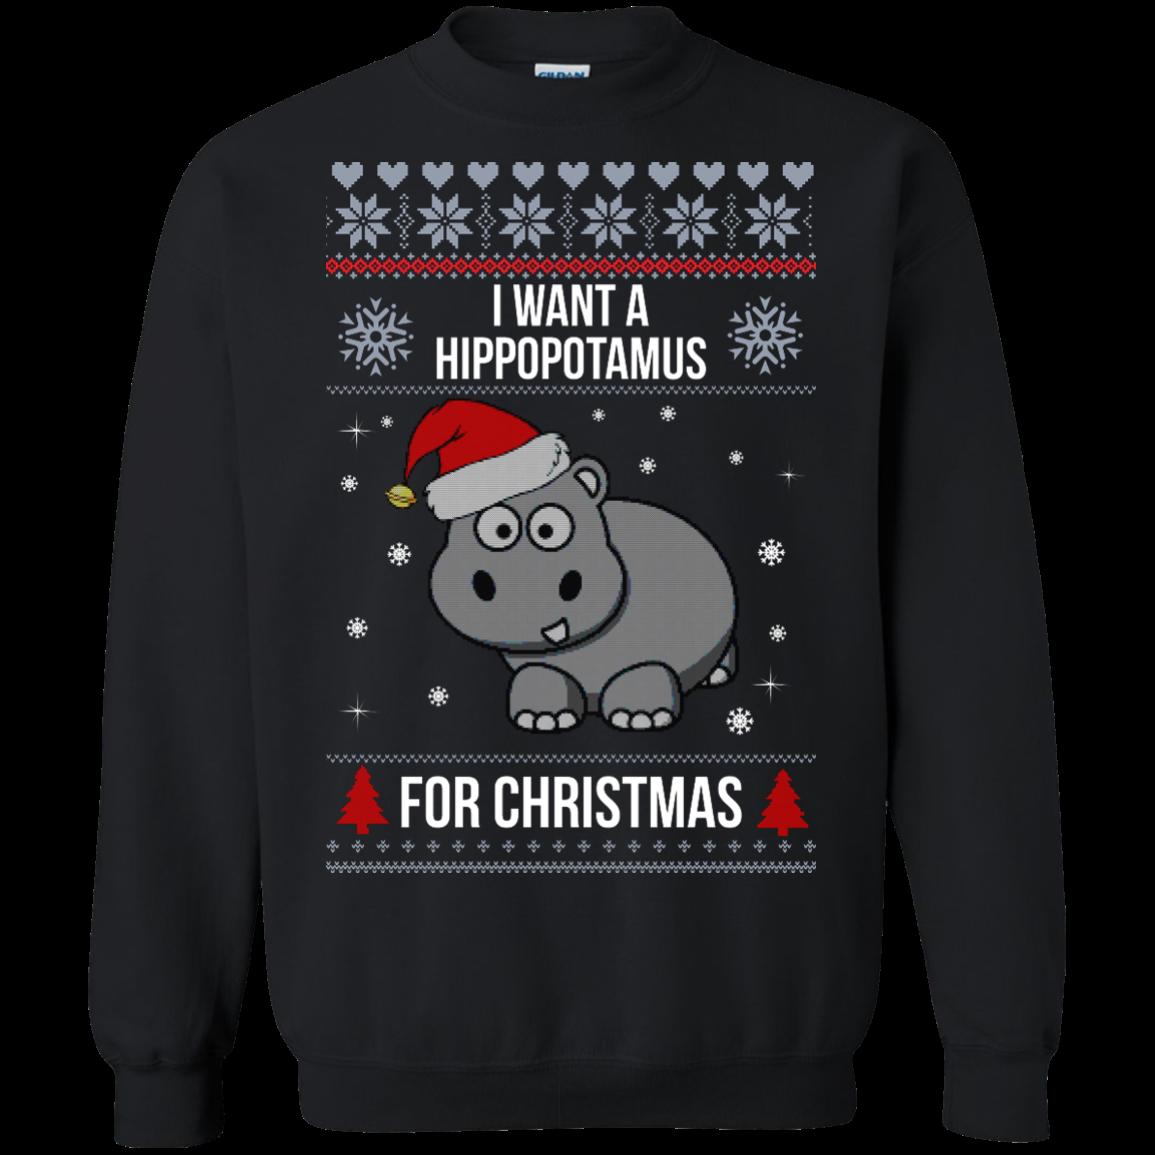 Hippopotamus Christmas Sweater I Want A Hippopotamus For Christmas Shirts